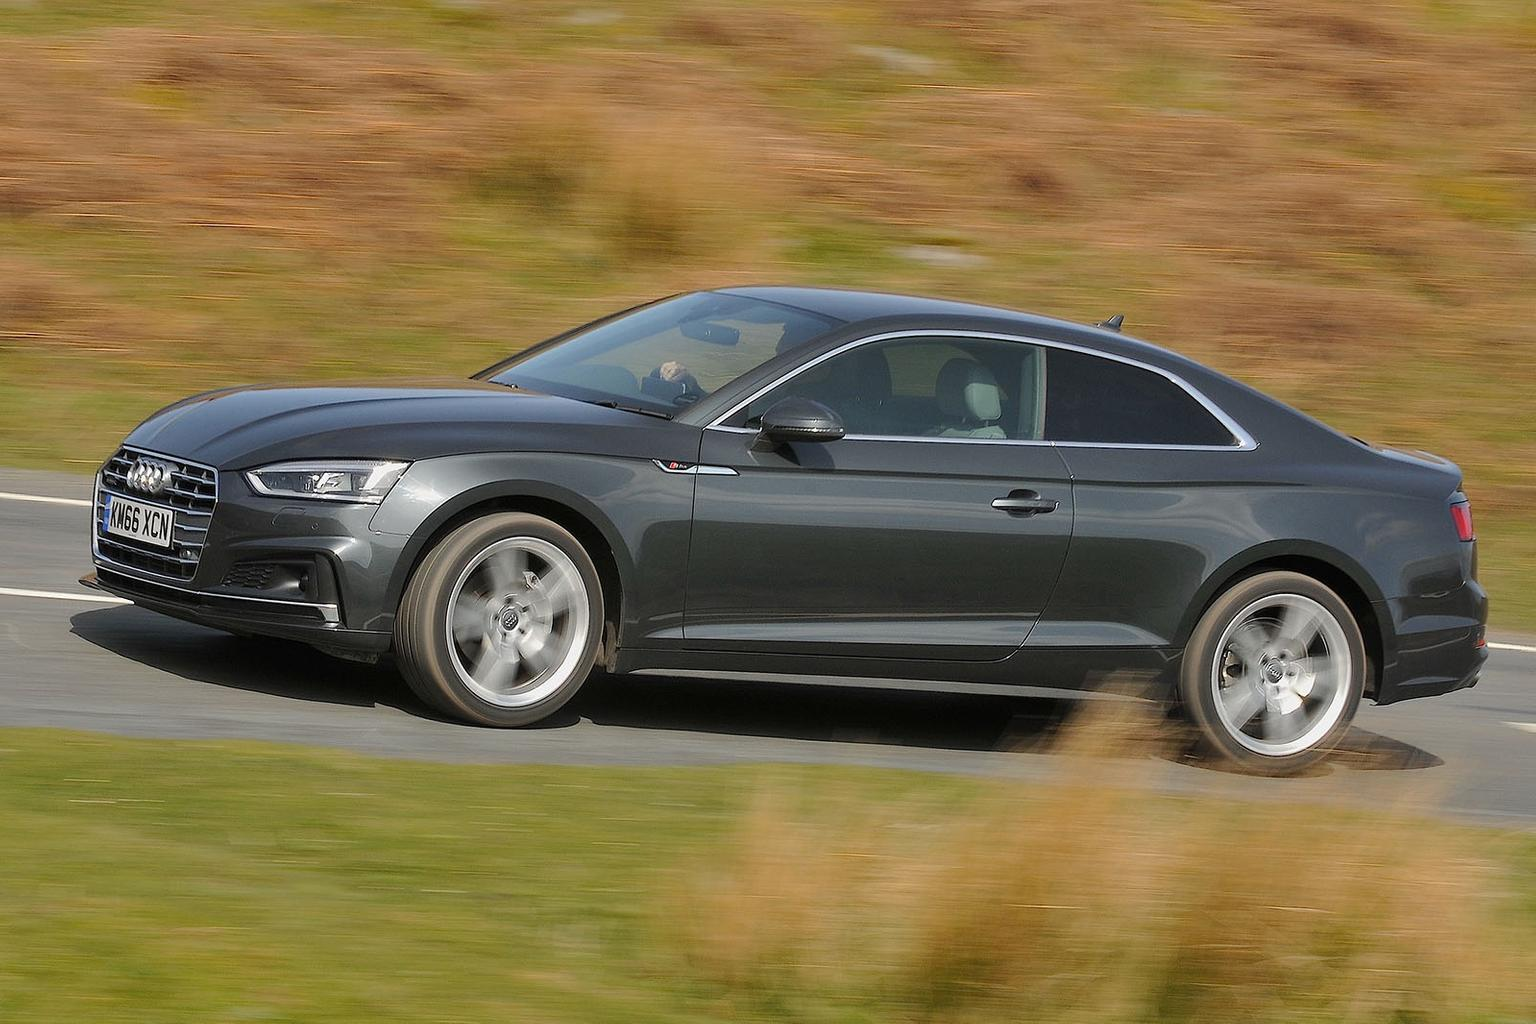 New Audi A5 Coupe vs new Mercedes E-Class Coupe